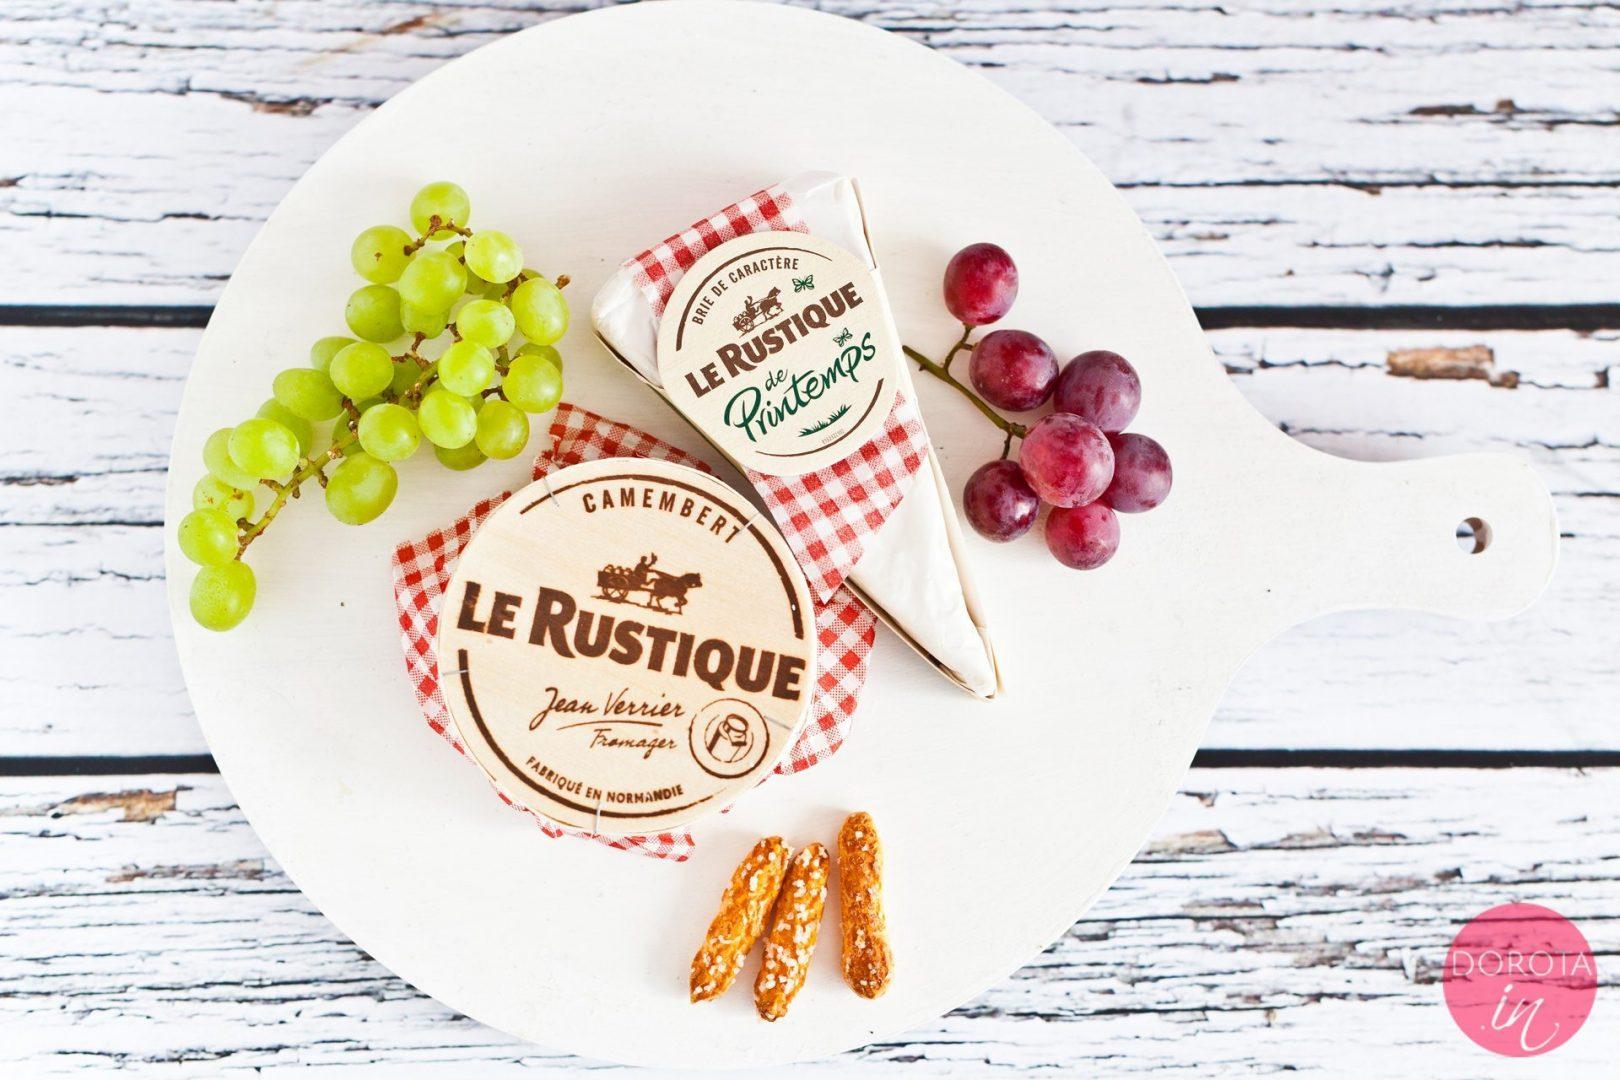 Ser pleśniowy Le Rustique - camembert i brie